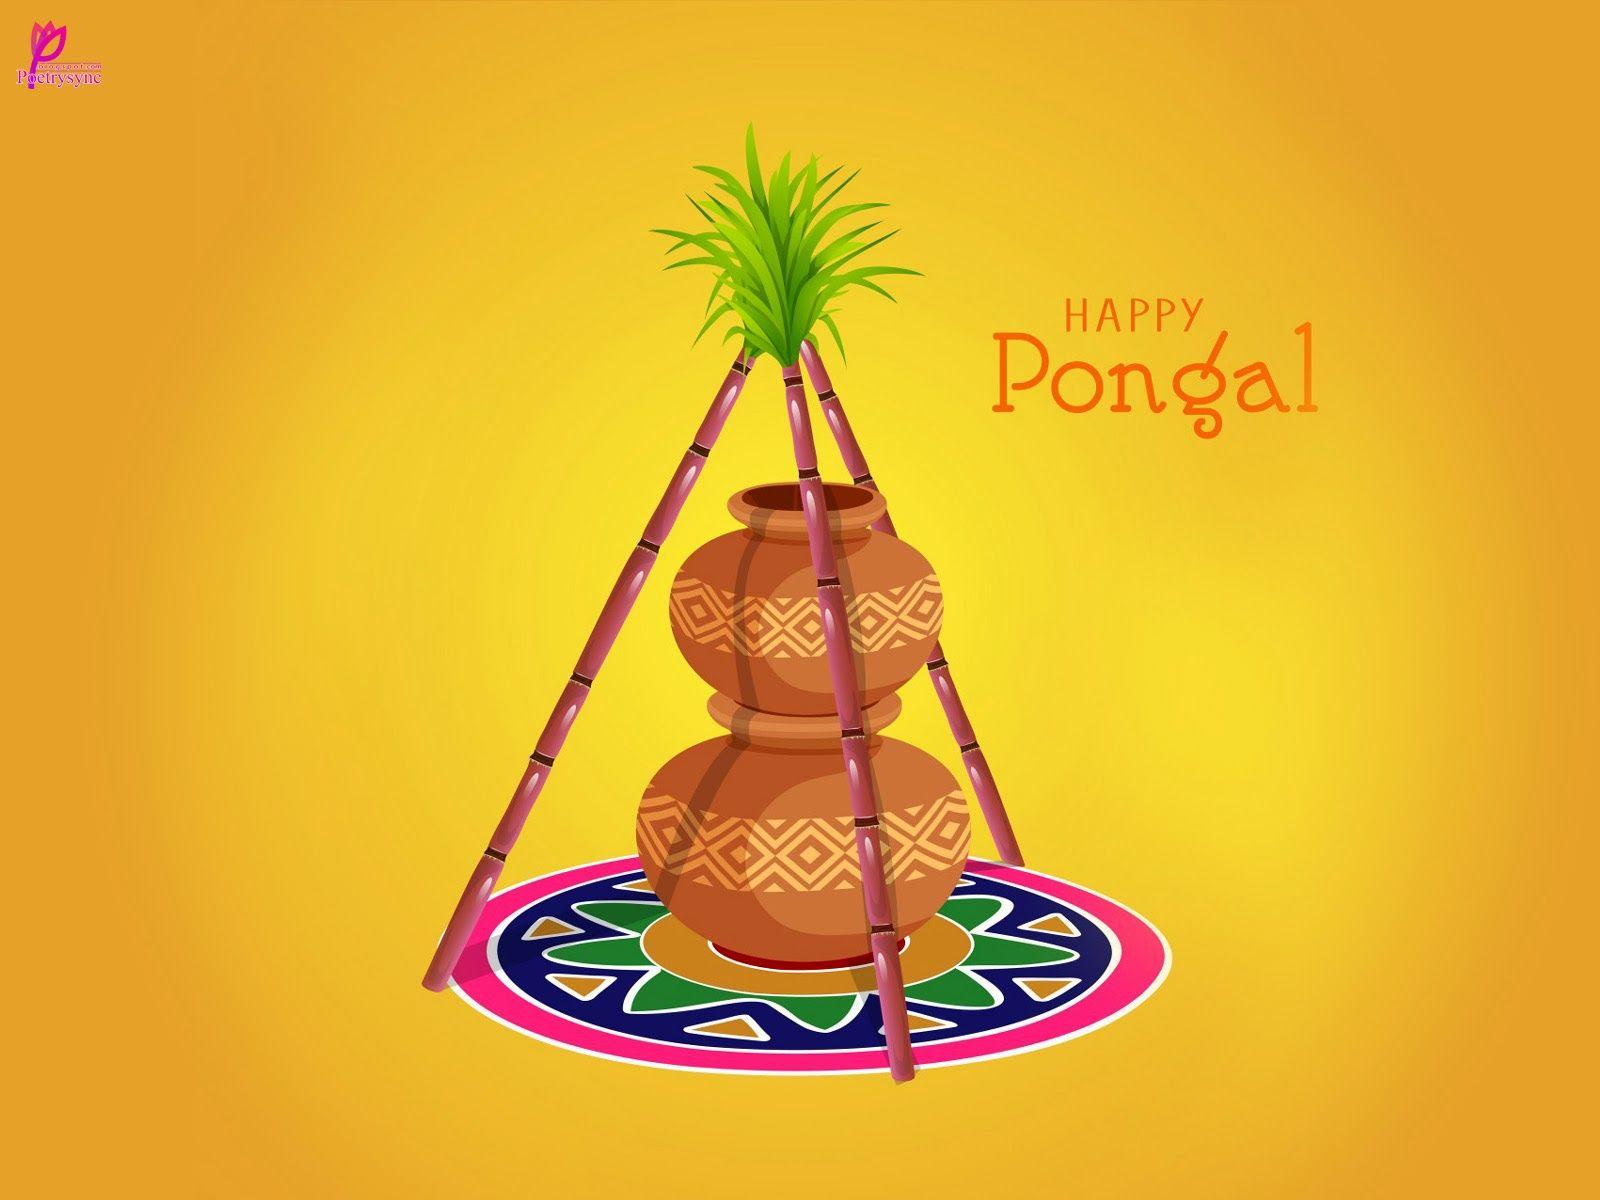 happy pongal wishes image eid milad un nabi happy happy pongal wishes image eid milad un nabi happy pongal hindu festivals and